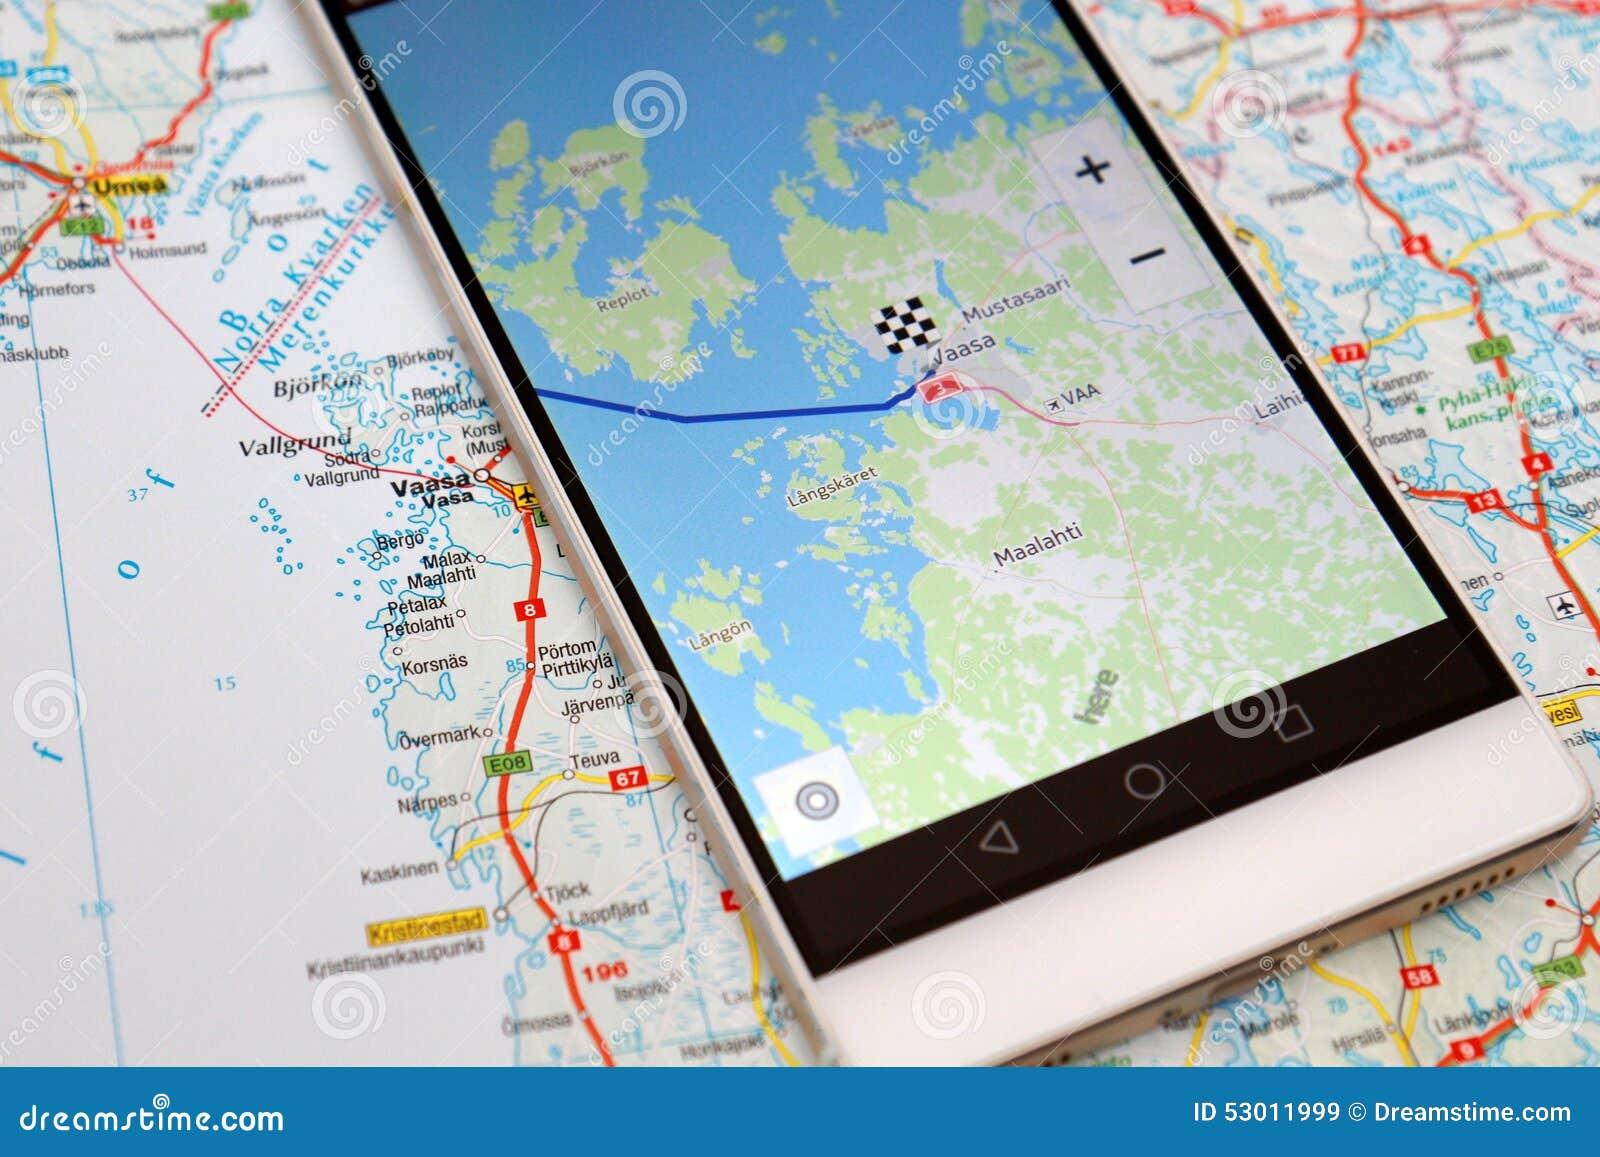 smartphone de carte de navigation de gps image stock image du syst me carte 53011999. Black Bedroom Furniture Sets. Home Design Ideas